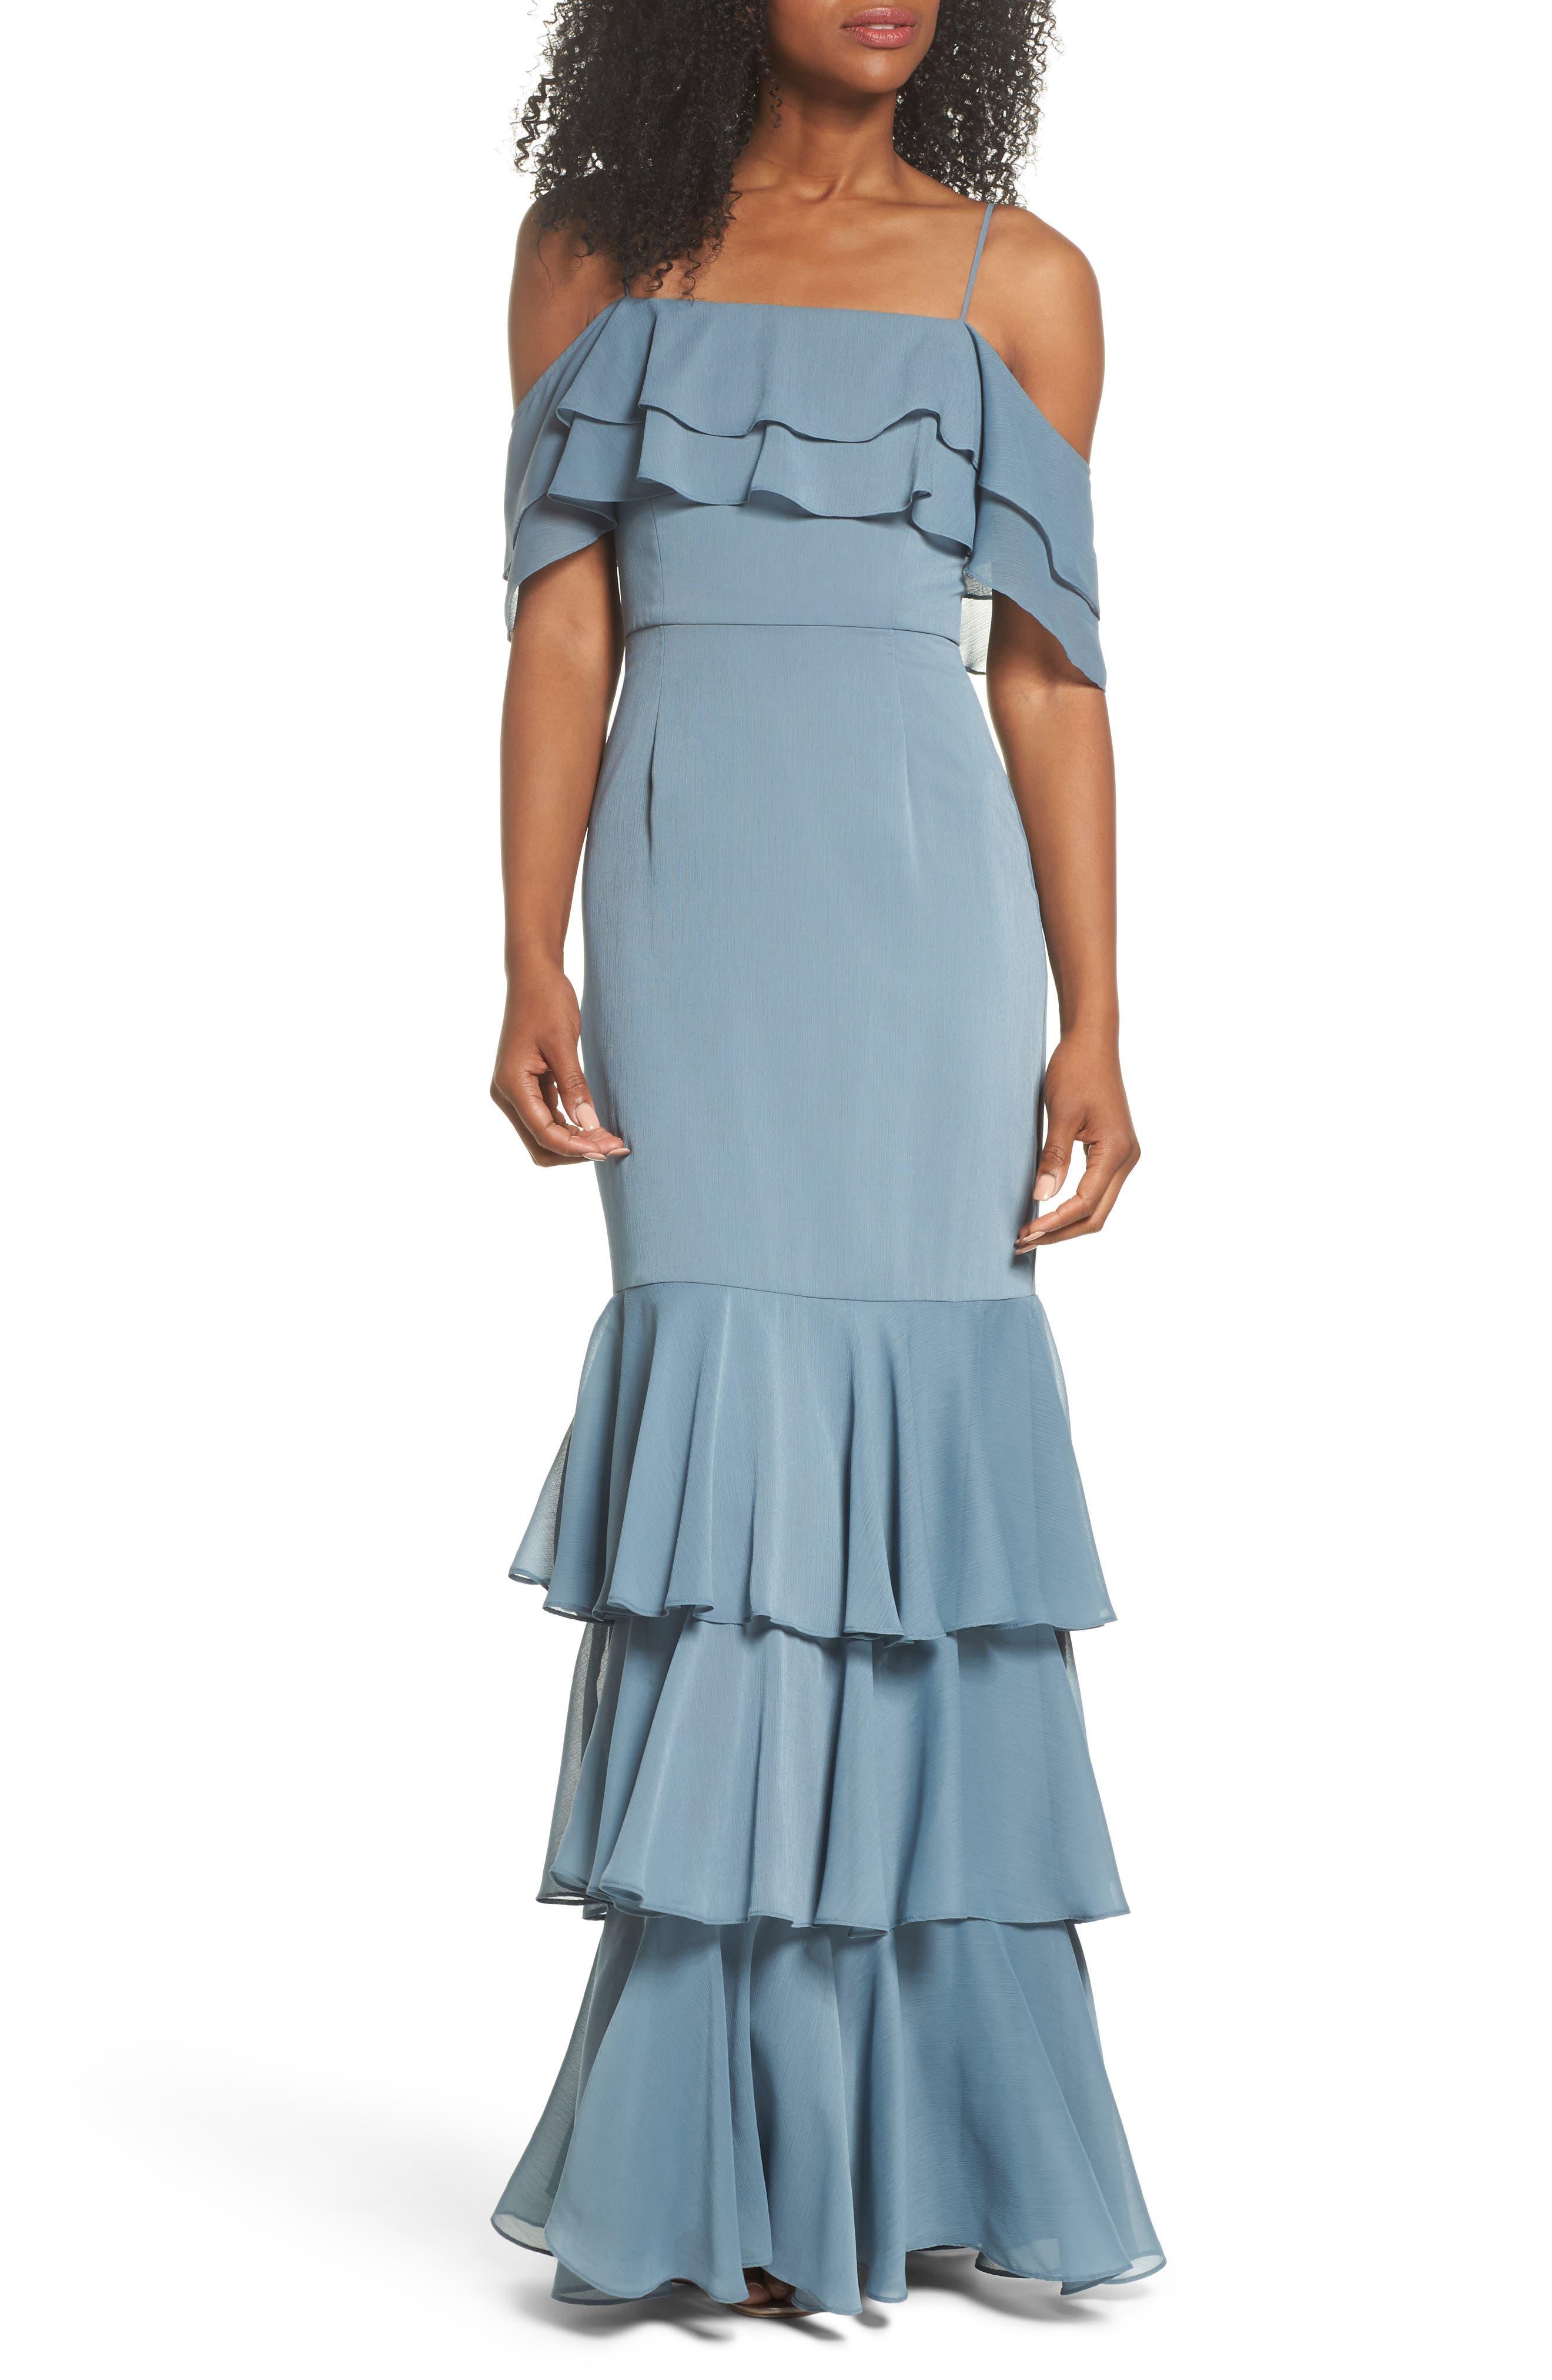 Alternate Image 1 Selected - WAYF Lauren Off the Shoulder Tiered Gown